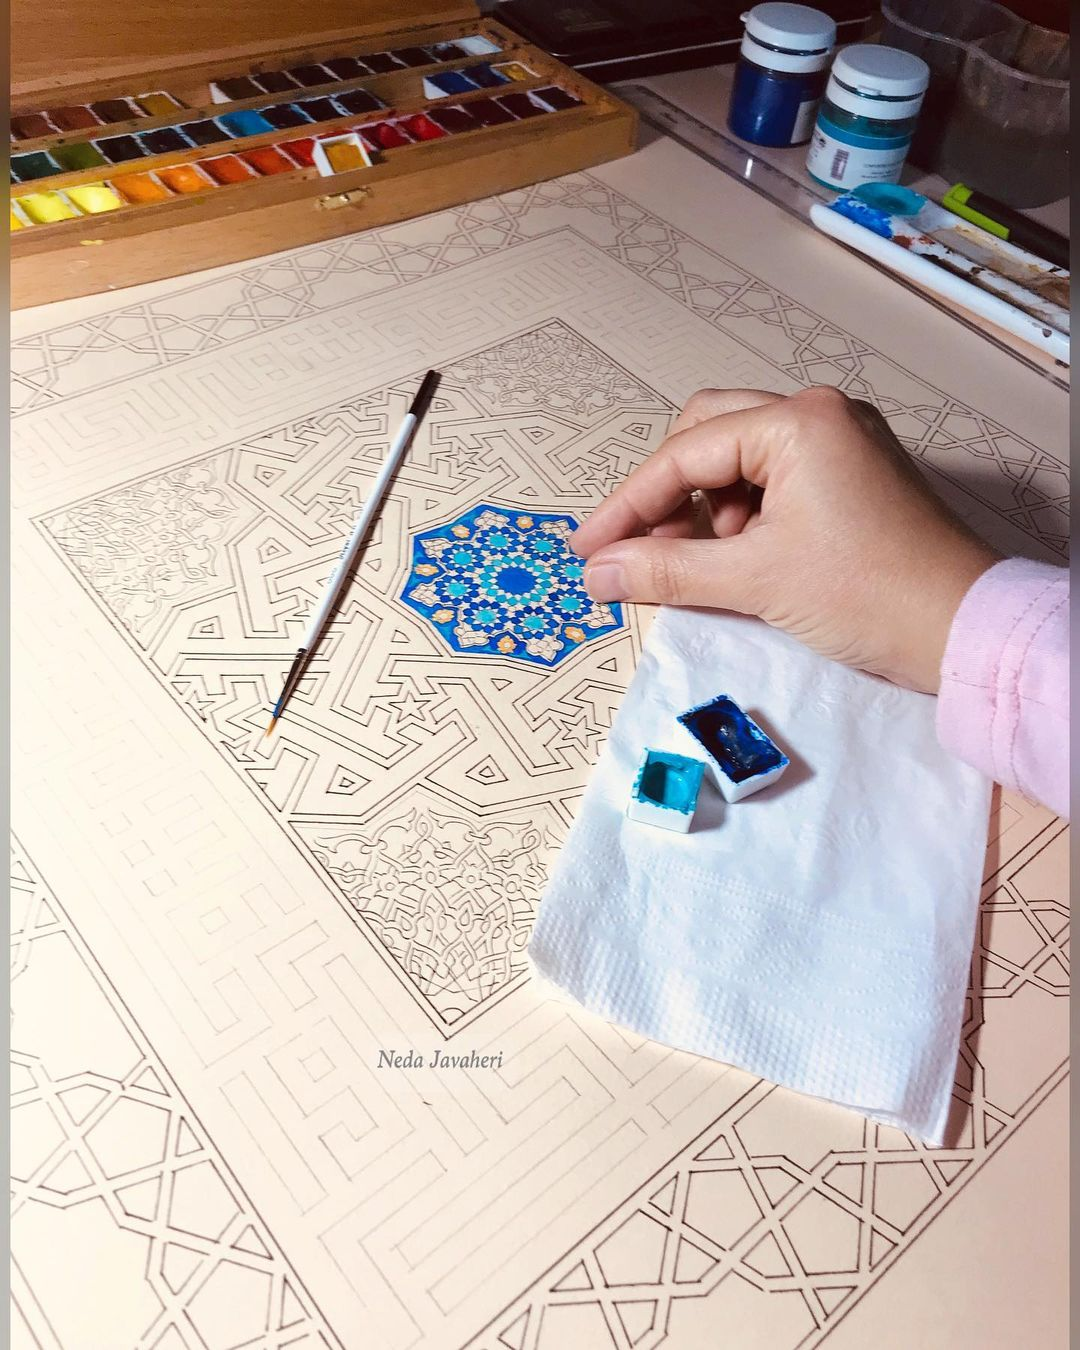 Karya Kaligrafi . و این کوچکترین دلبر  بچه ها یه توضیحی در مورد طراحیها بدهم.  ببینین سالها پیش…- Ne Javaher